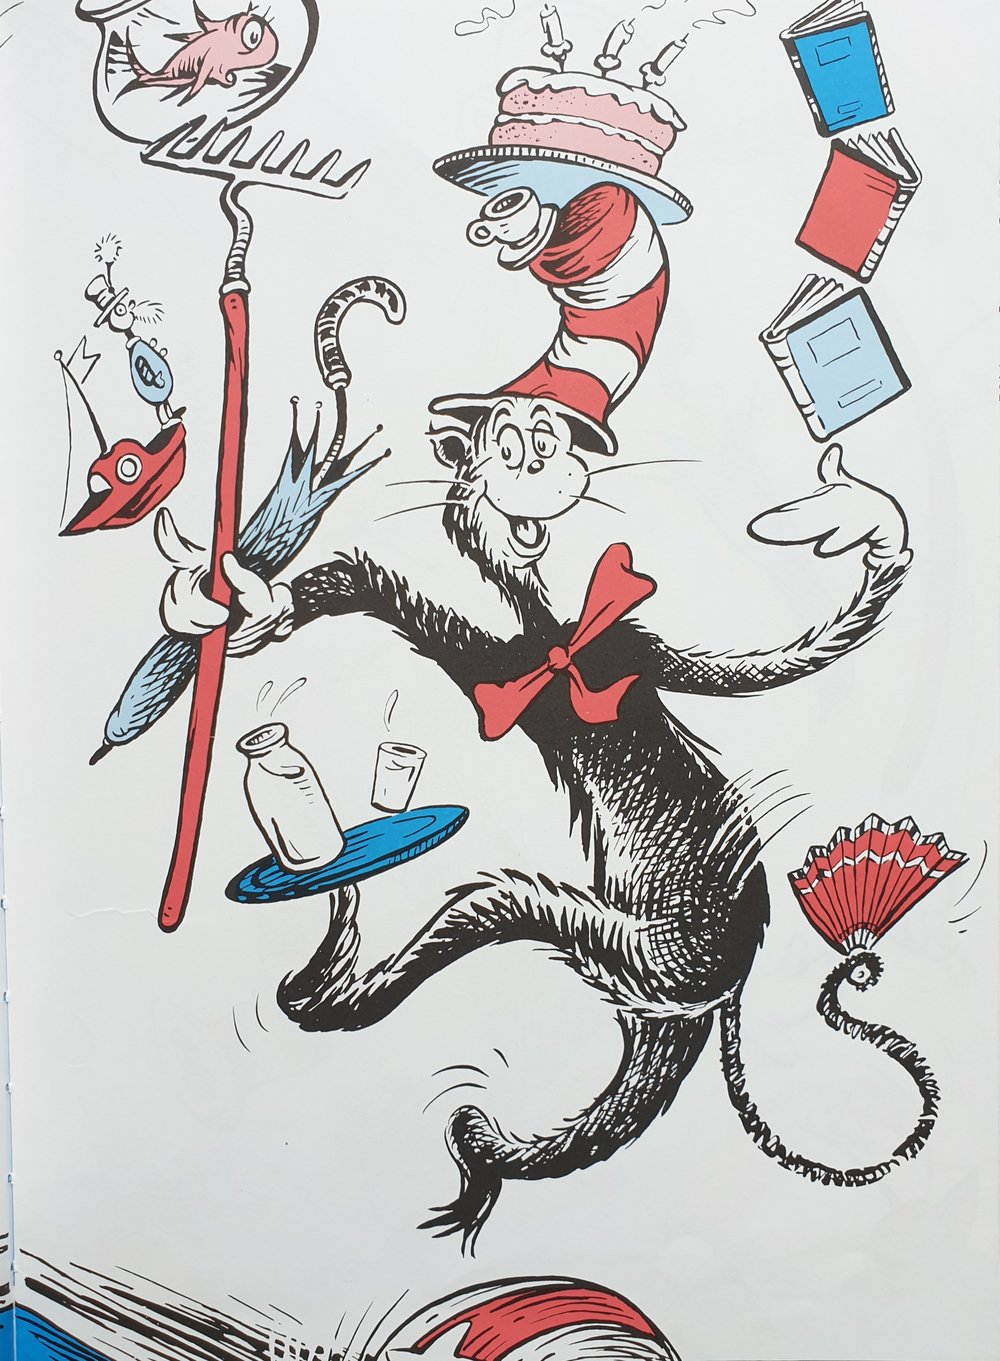 © 1957 by Dr. Seuss